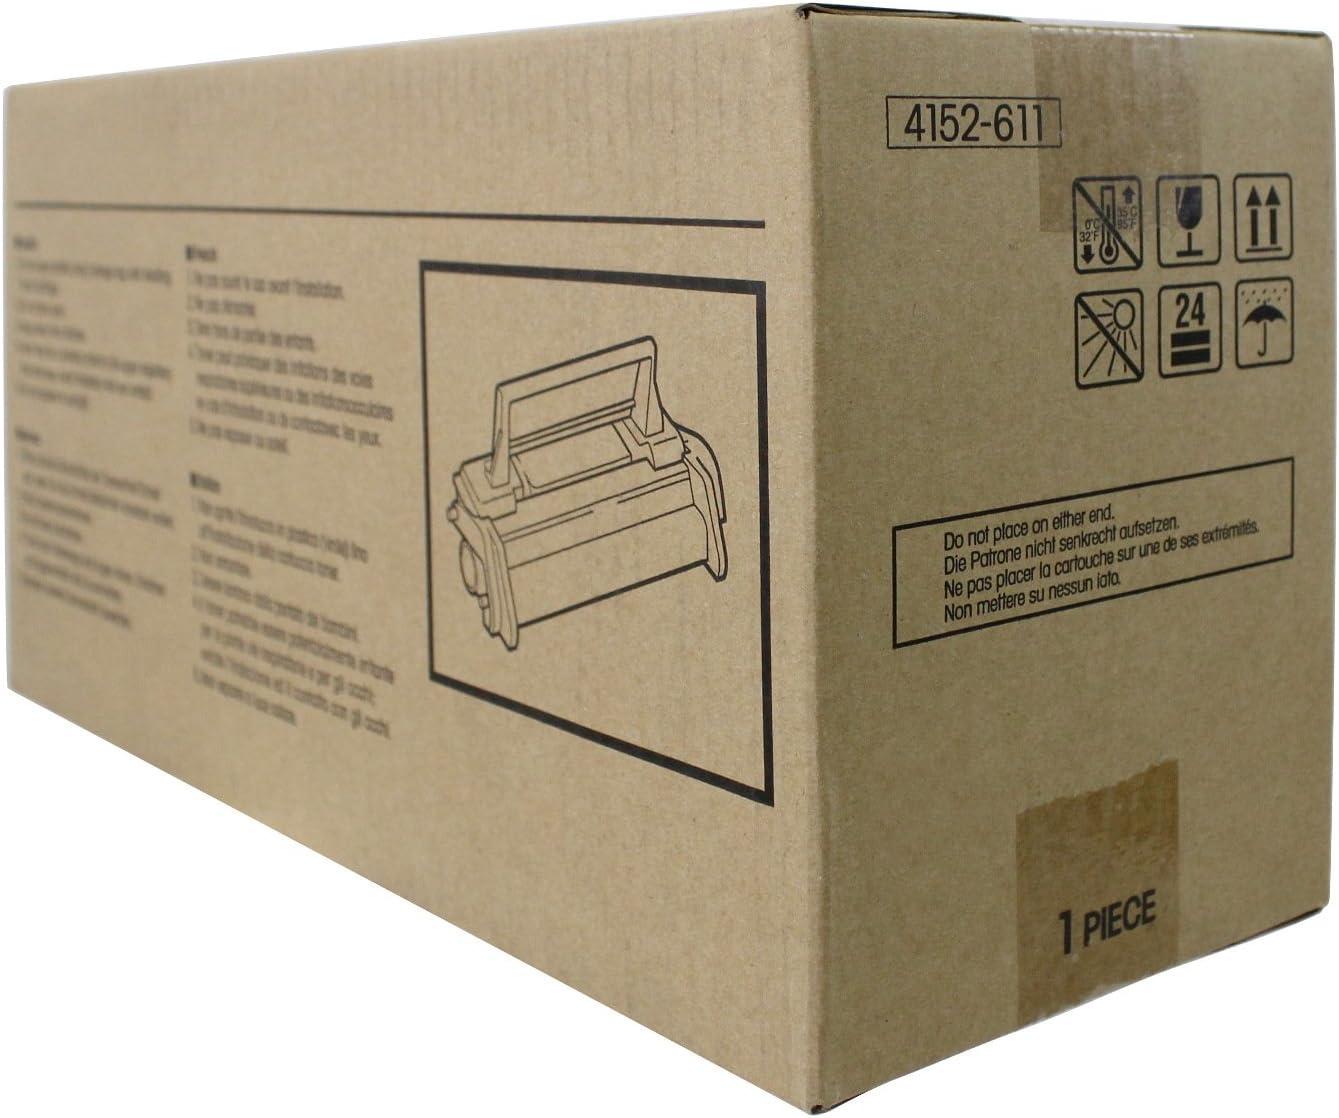 Konica-Minolta 4152611 4152611 Toner, 6000 Page-Yield, Black